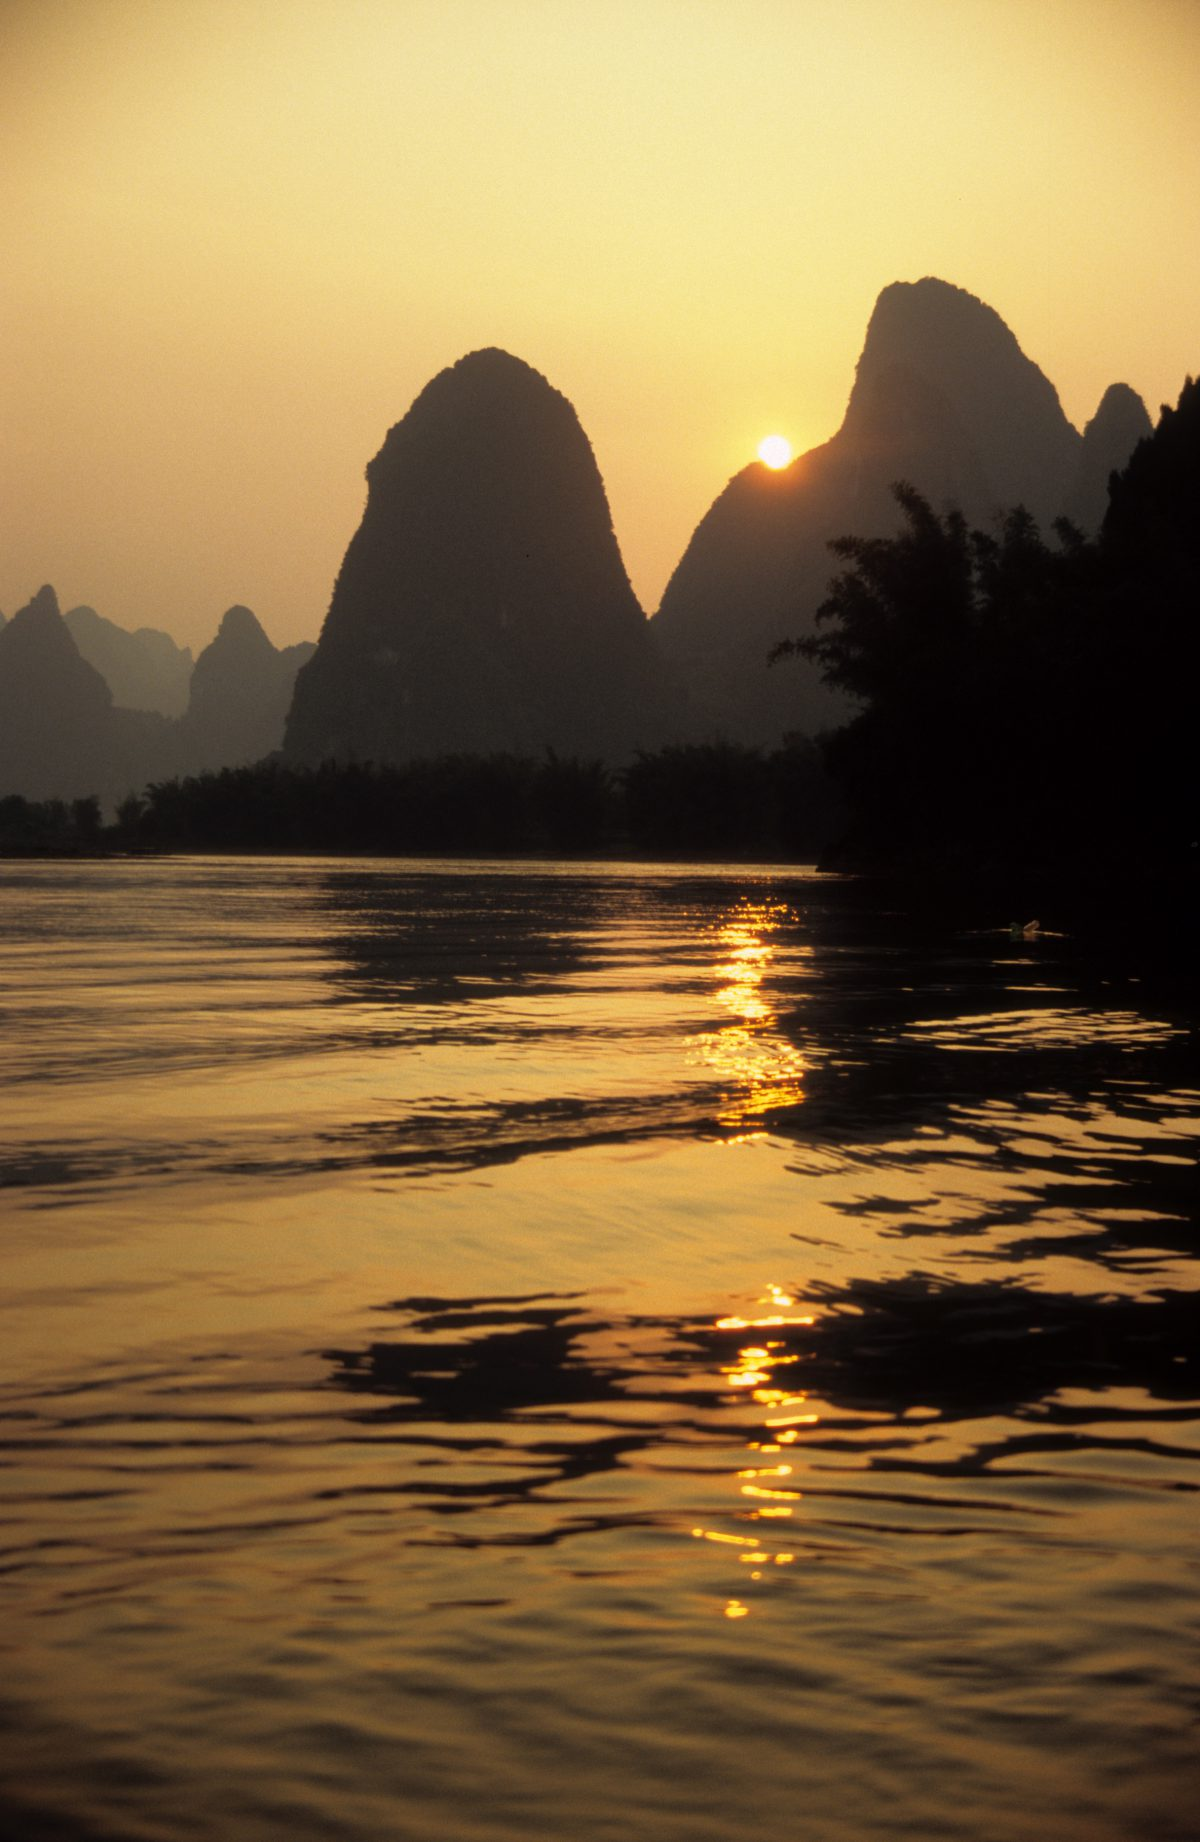 Li River Cruise, sunset, reflection, water, mountain